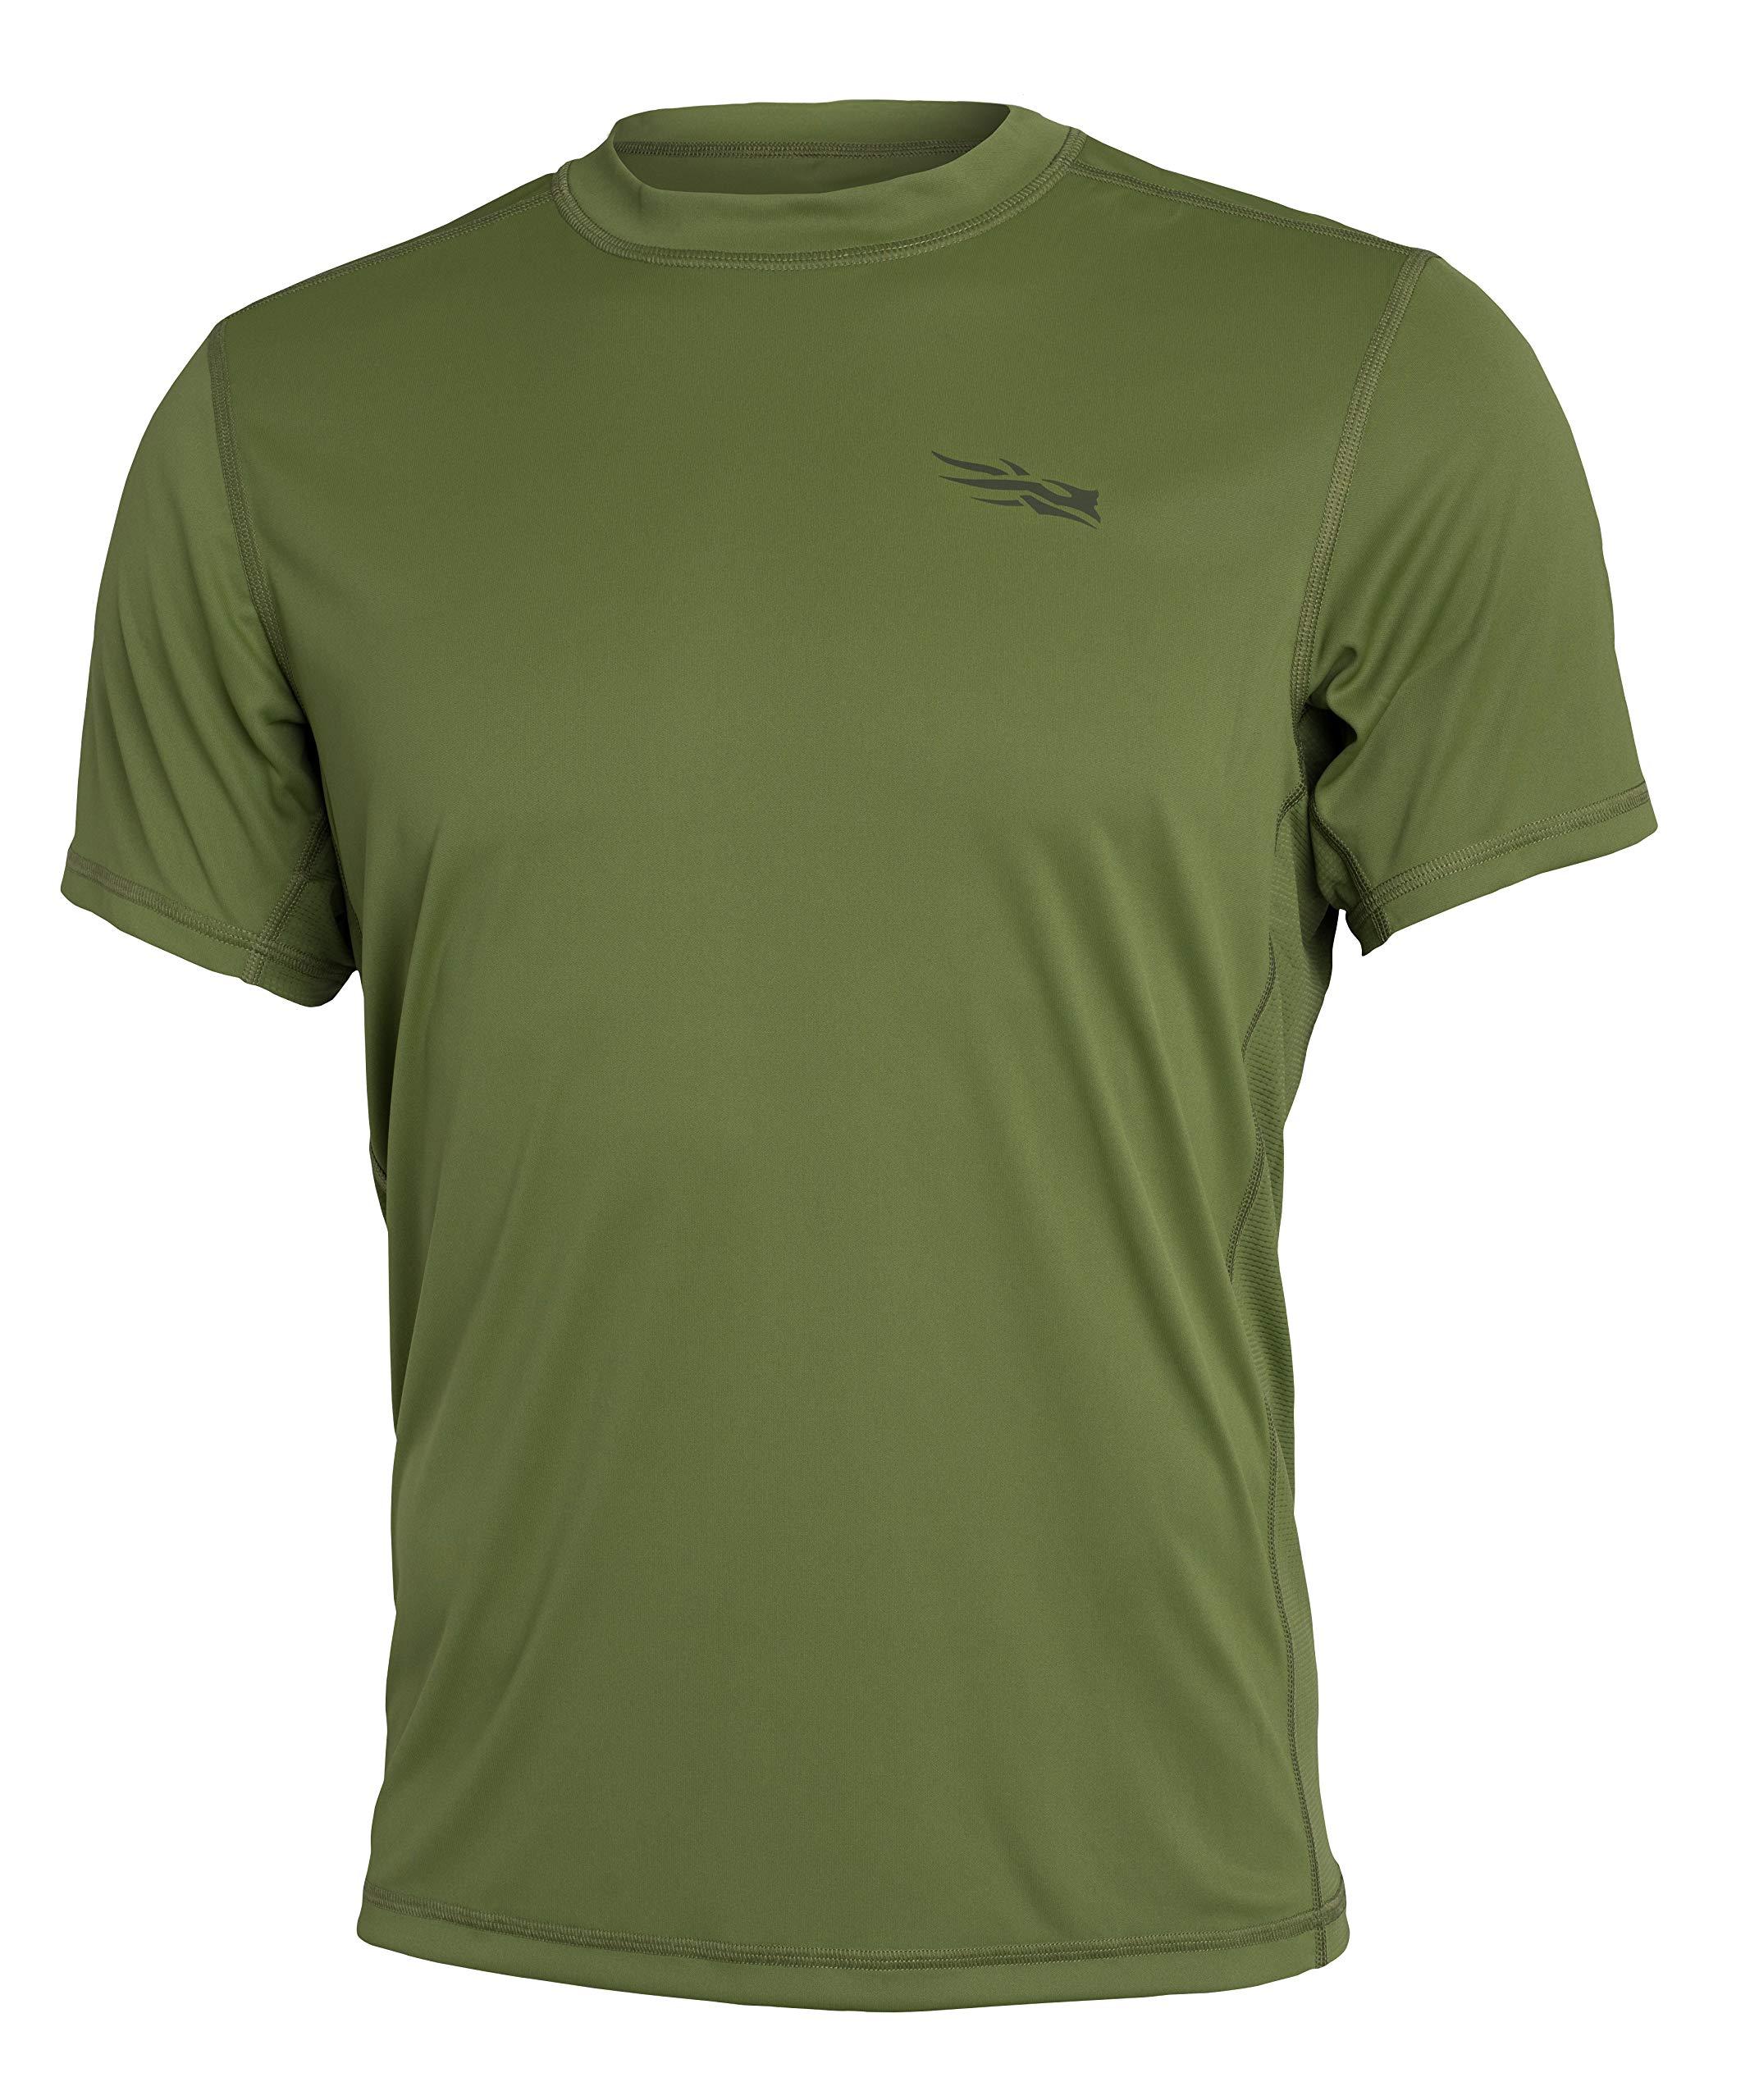 NAVISKIN Womens Thermal Fleece Half Zip Thumbholes Long Sleeve Shirts Outdoor Running Top